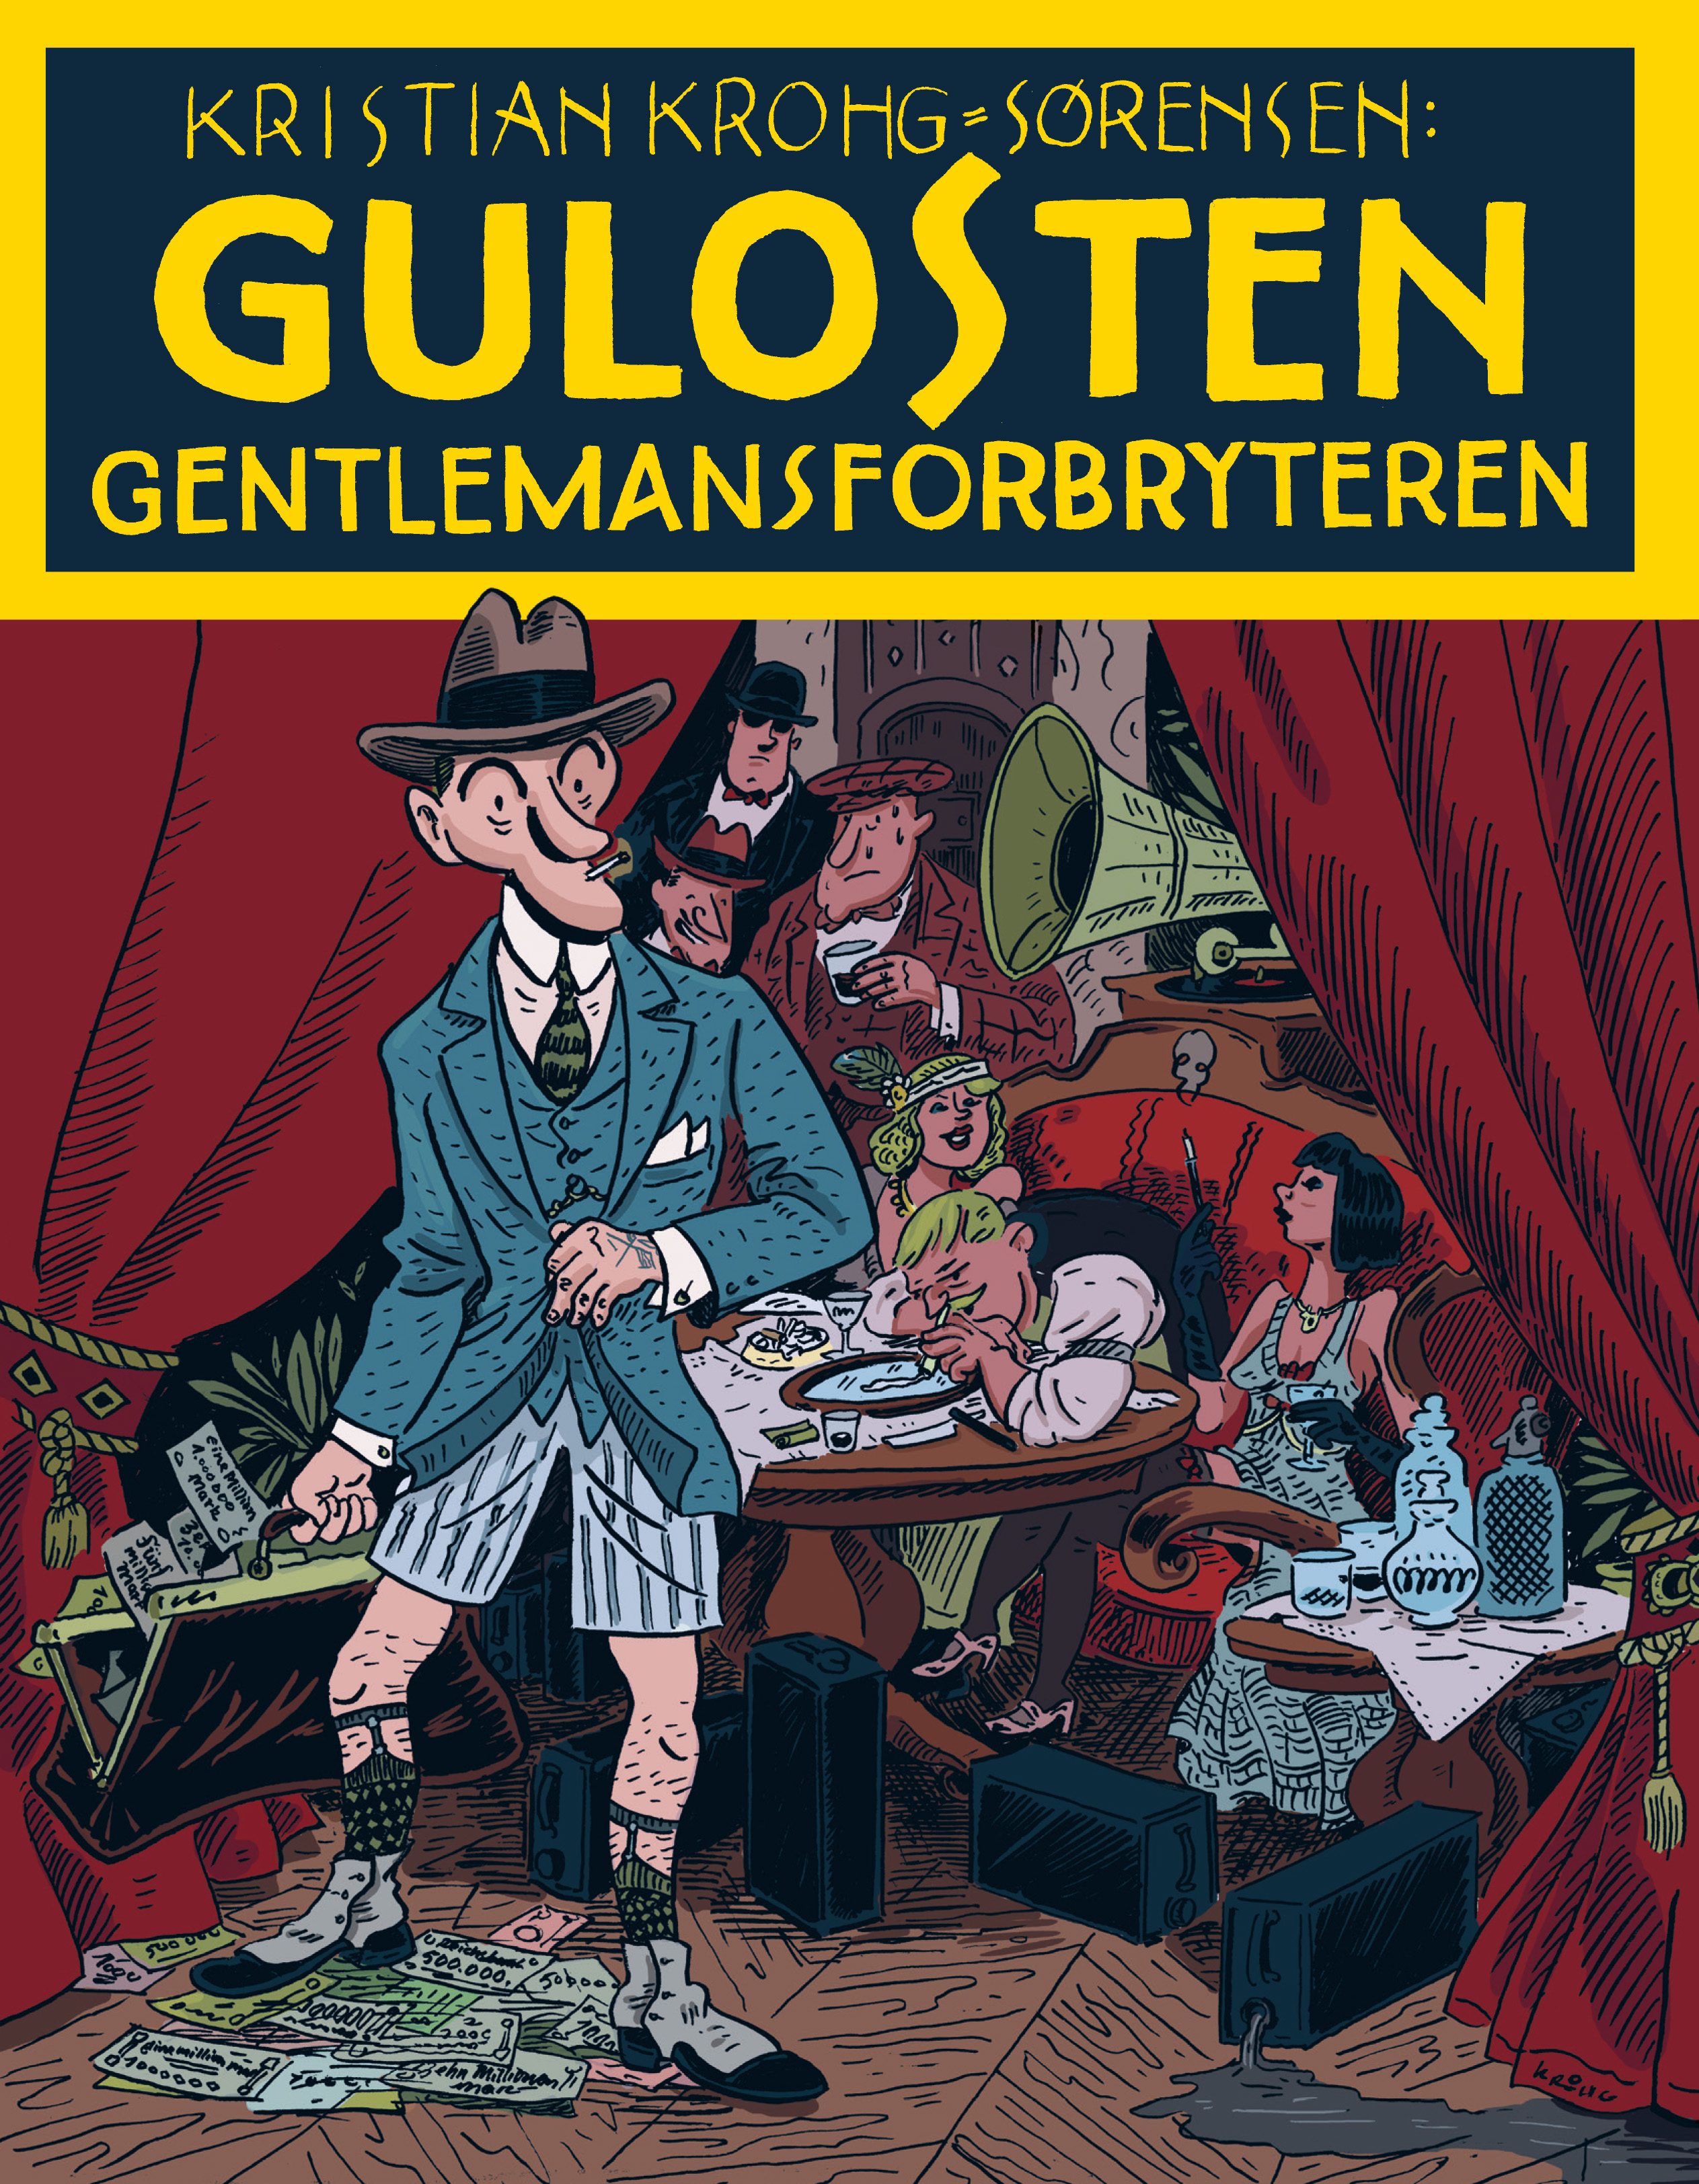 """Gulosten - gentlemansforbryteren"" av Kristian Krohg-Sørensen"